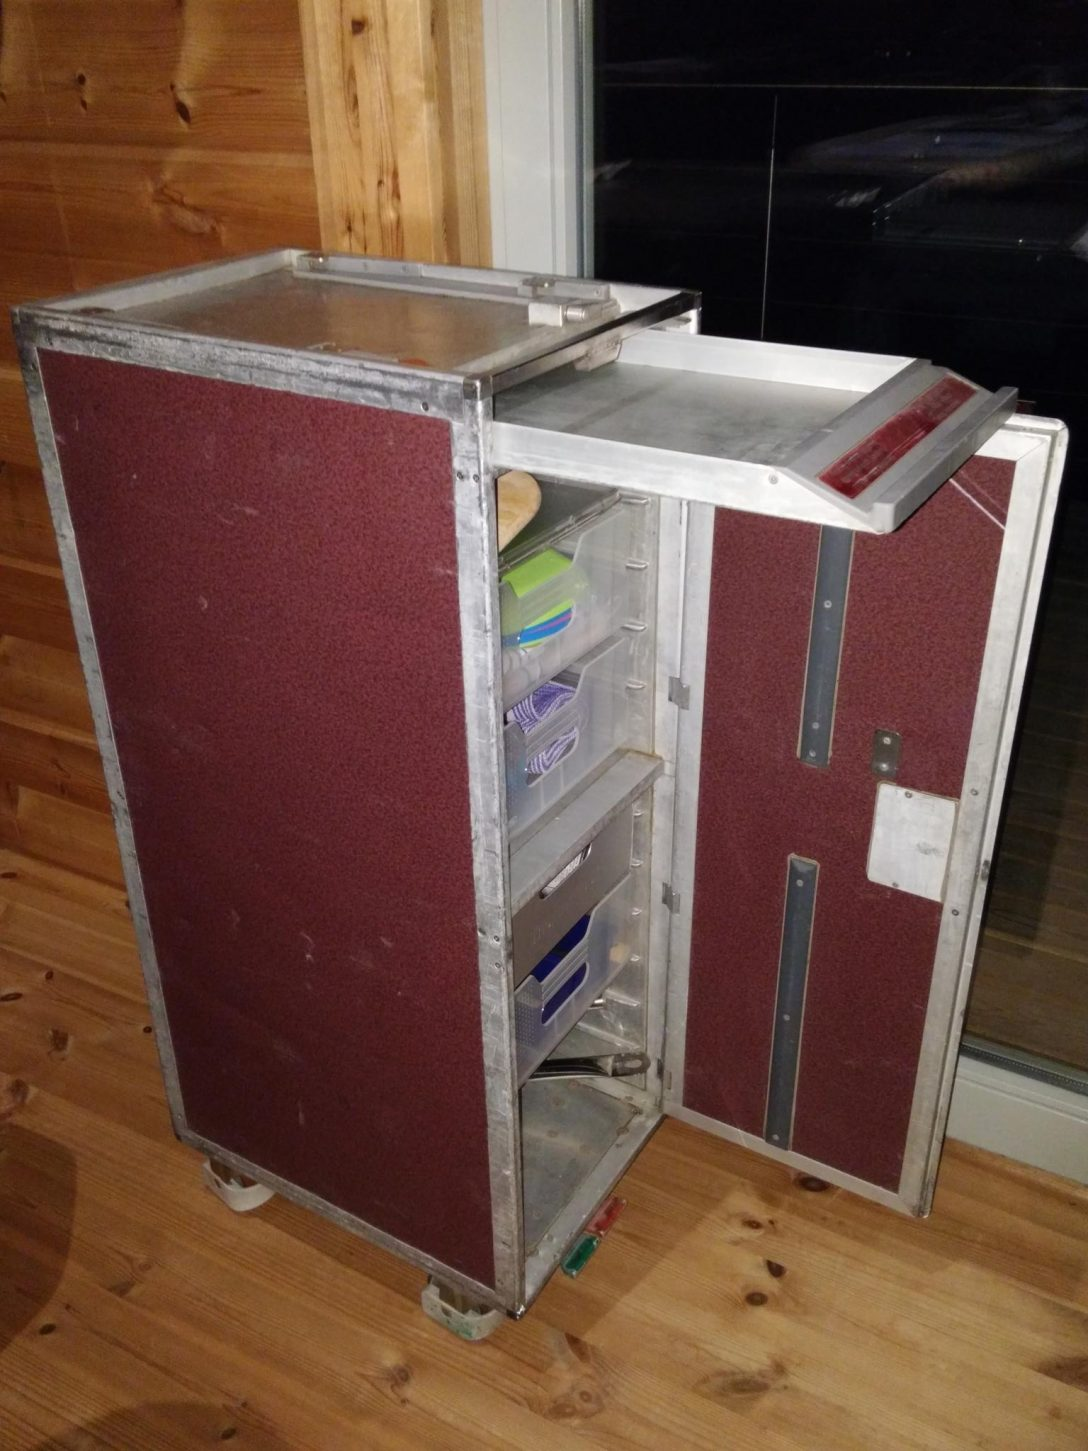 Full Size of Singleküche Ikea Värde Mit Kühlschrank E Geräten Küche Kosten Betten Bei Kaufen Modulküche Miniküche 160x200 Sofa Schlaffunktion Wohnzimmer Singleküche Ikea Värde